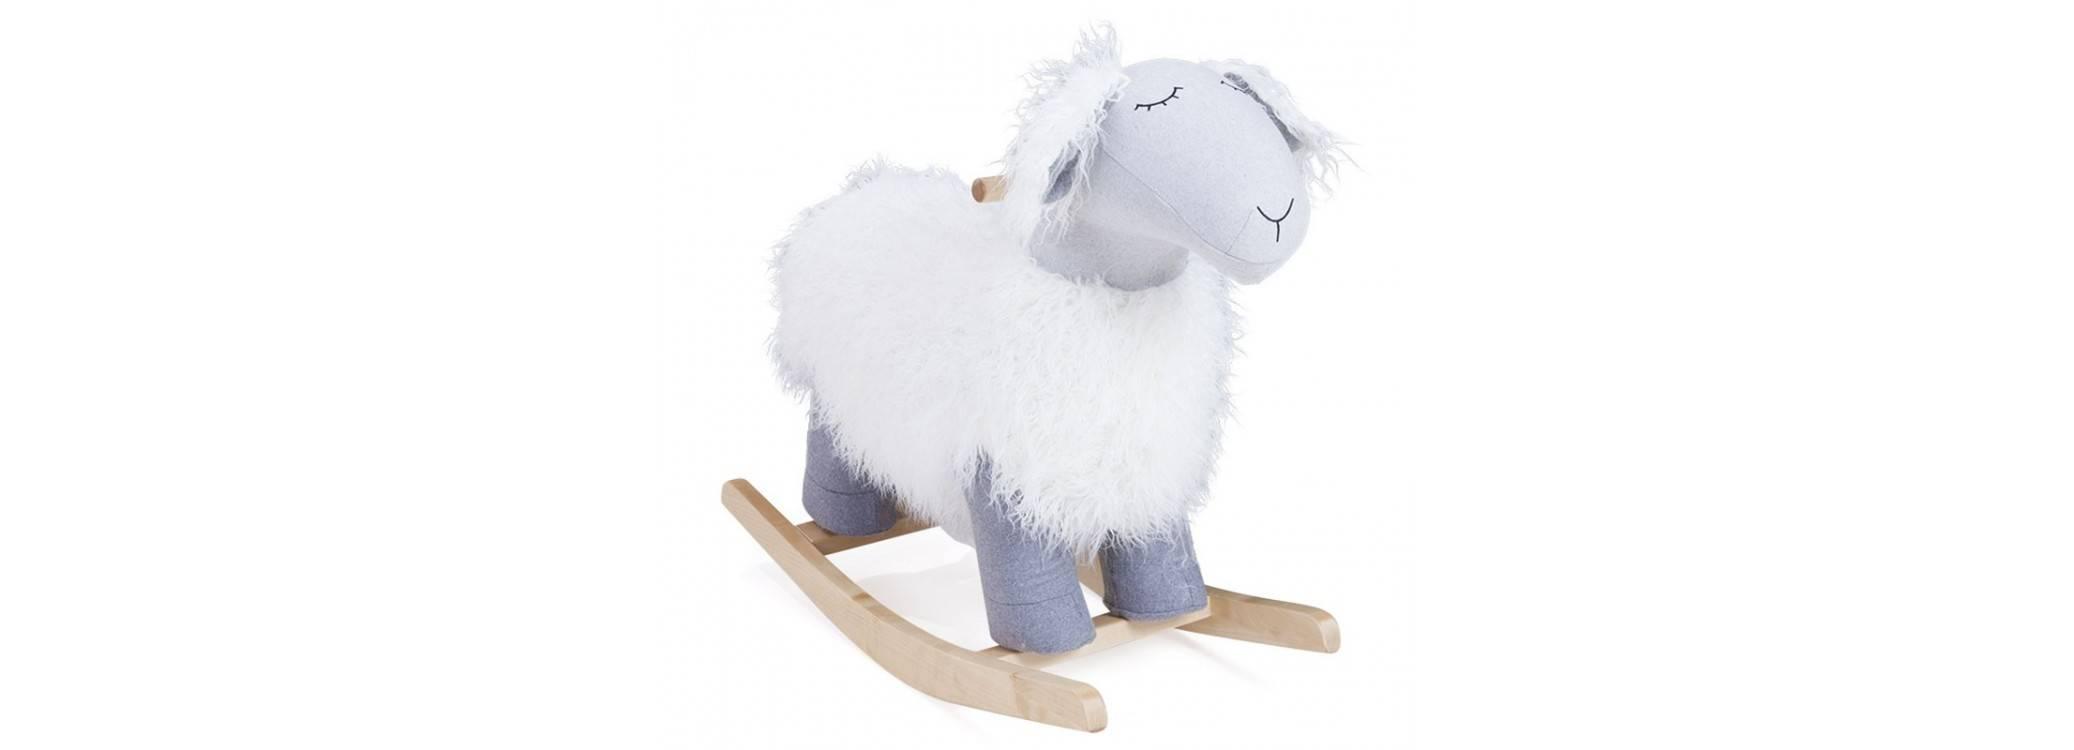 Rocking-chair, mouton à bascule